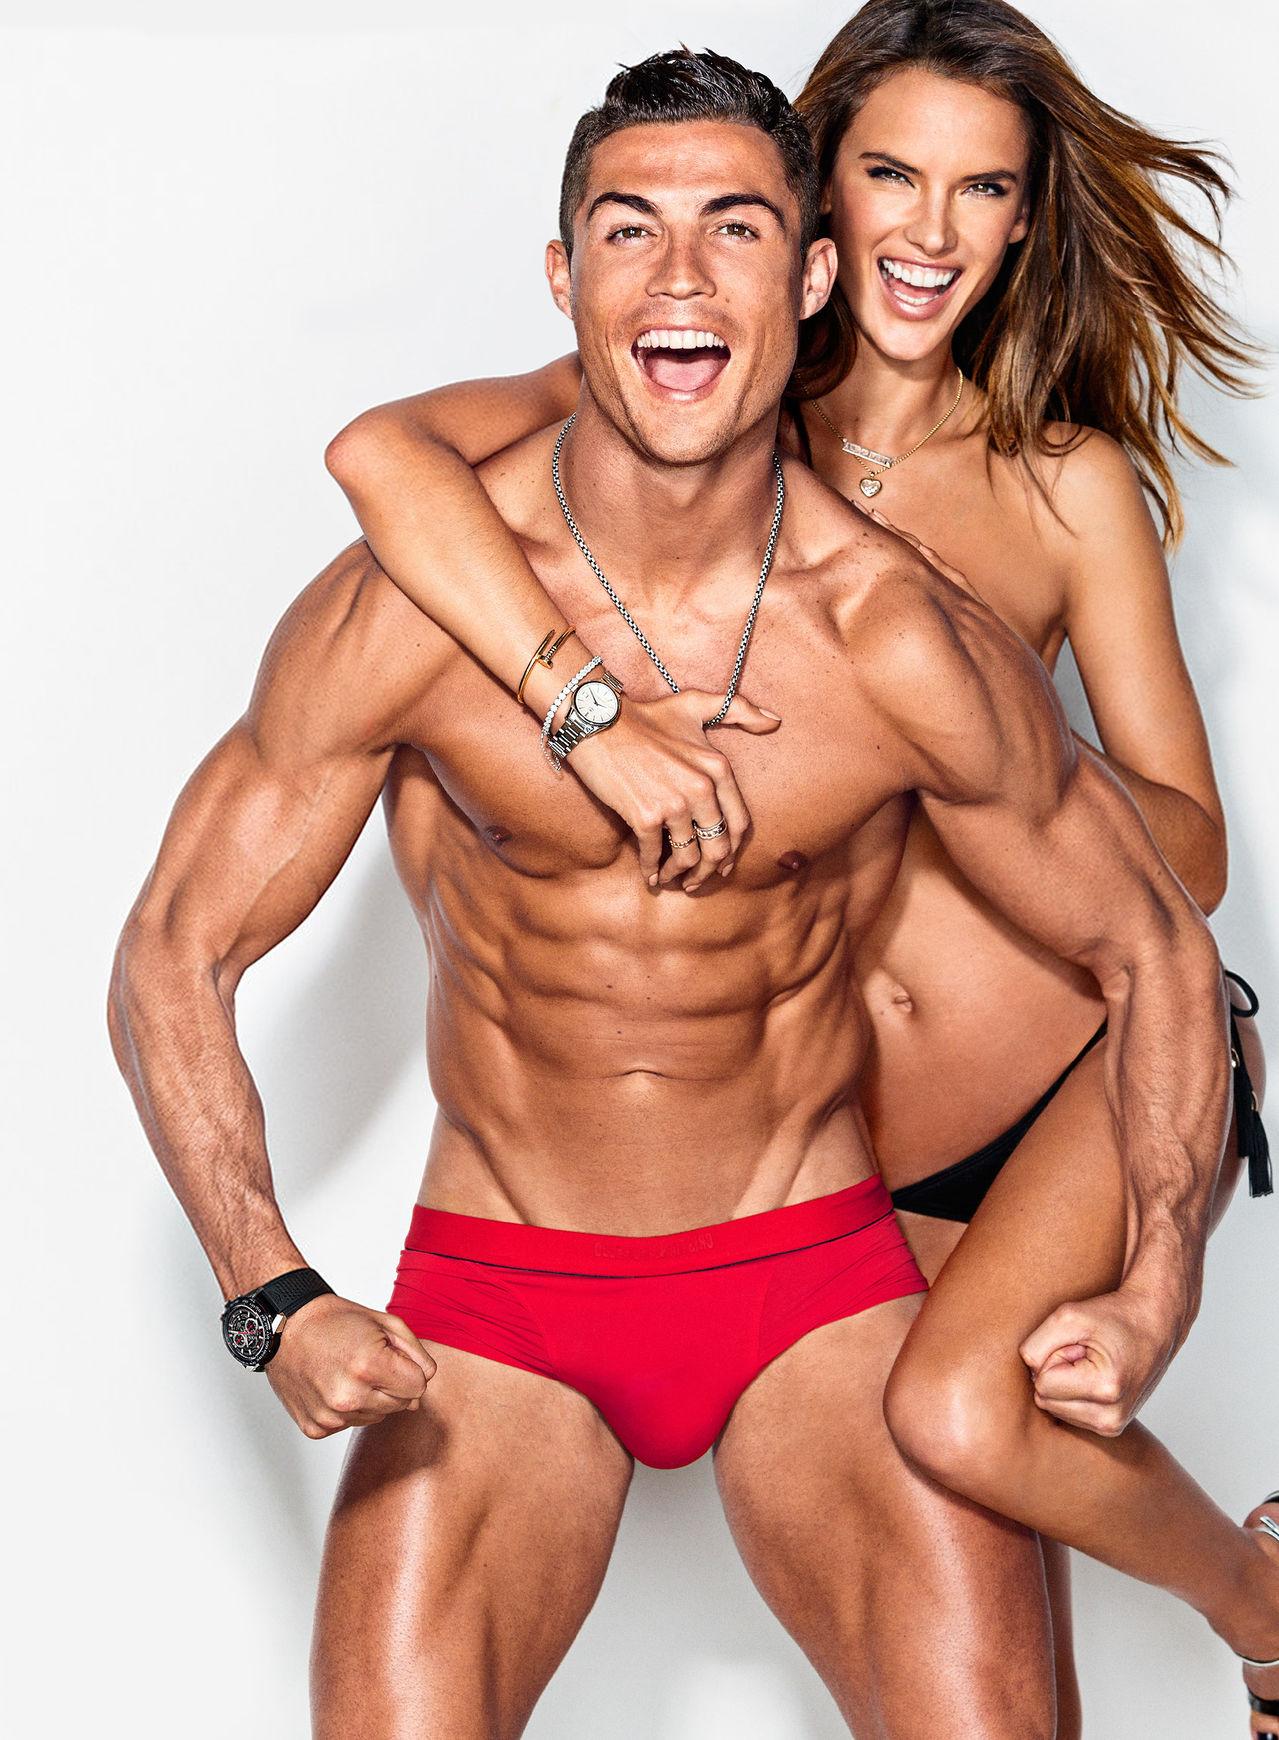 Cristiano Ronaldo Joins Alessandra Ambrosio for GQ's February 2016 Cover